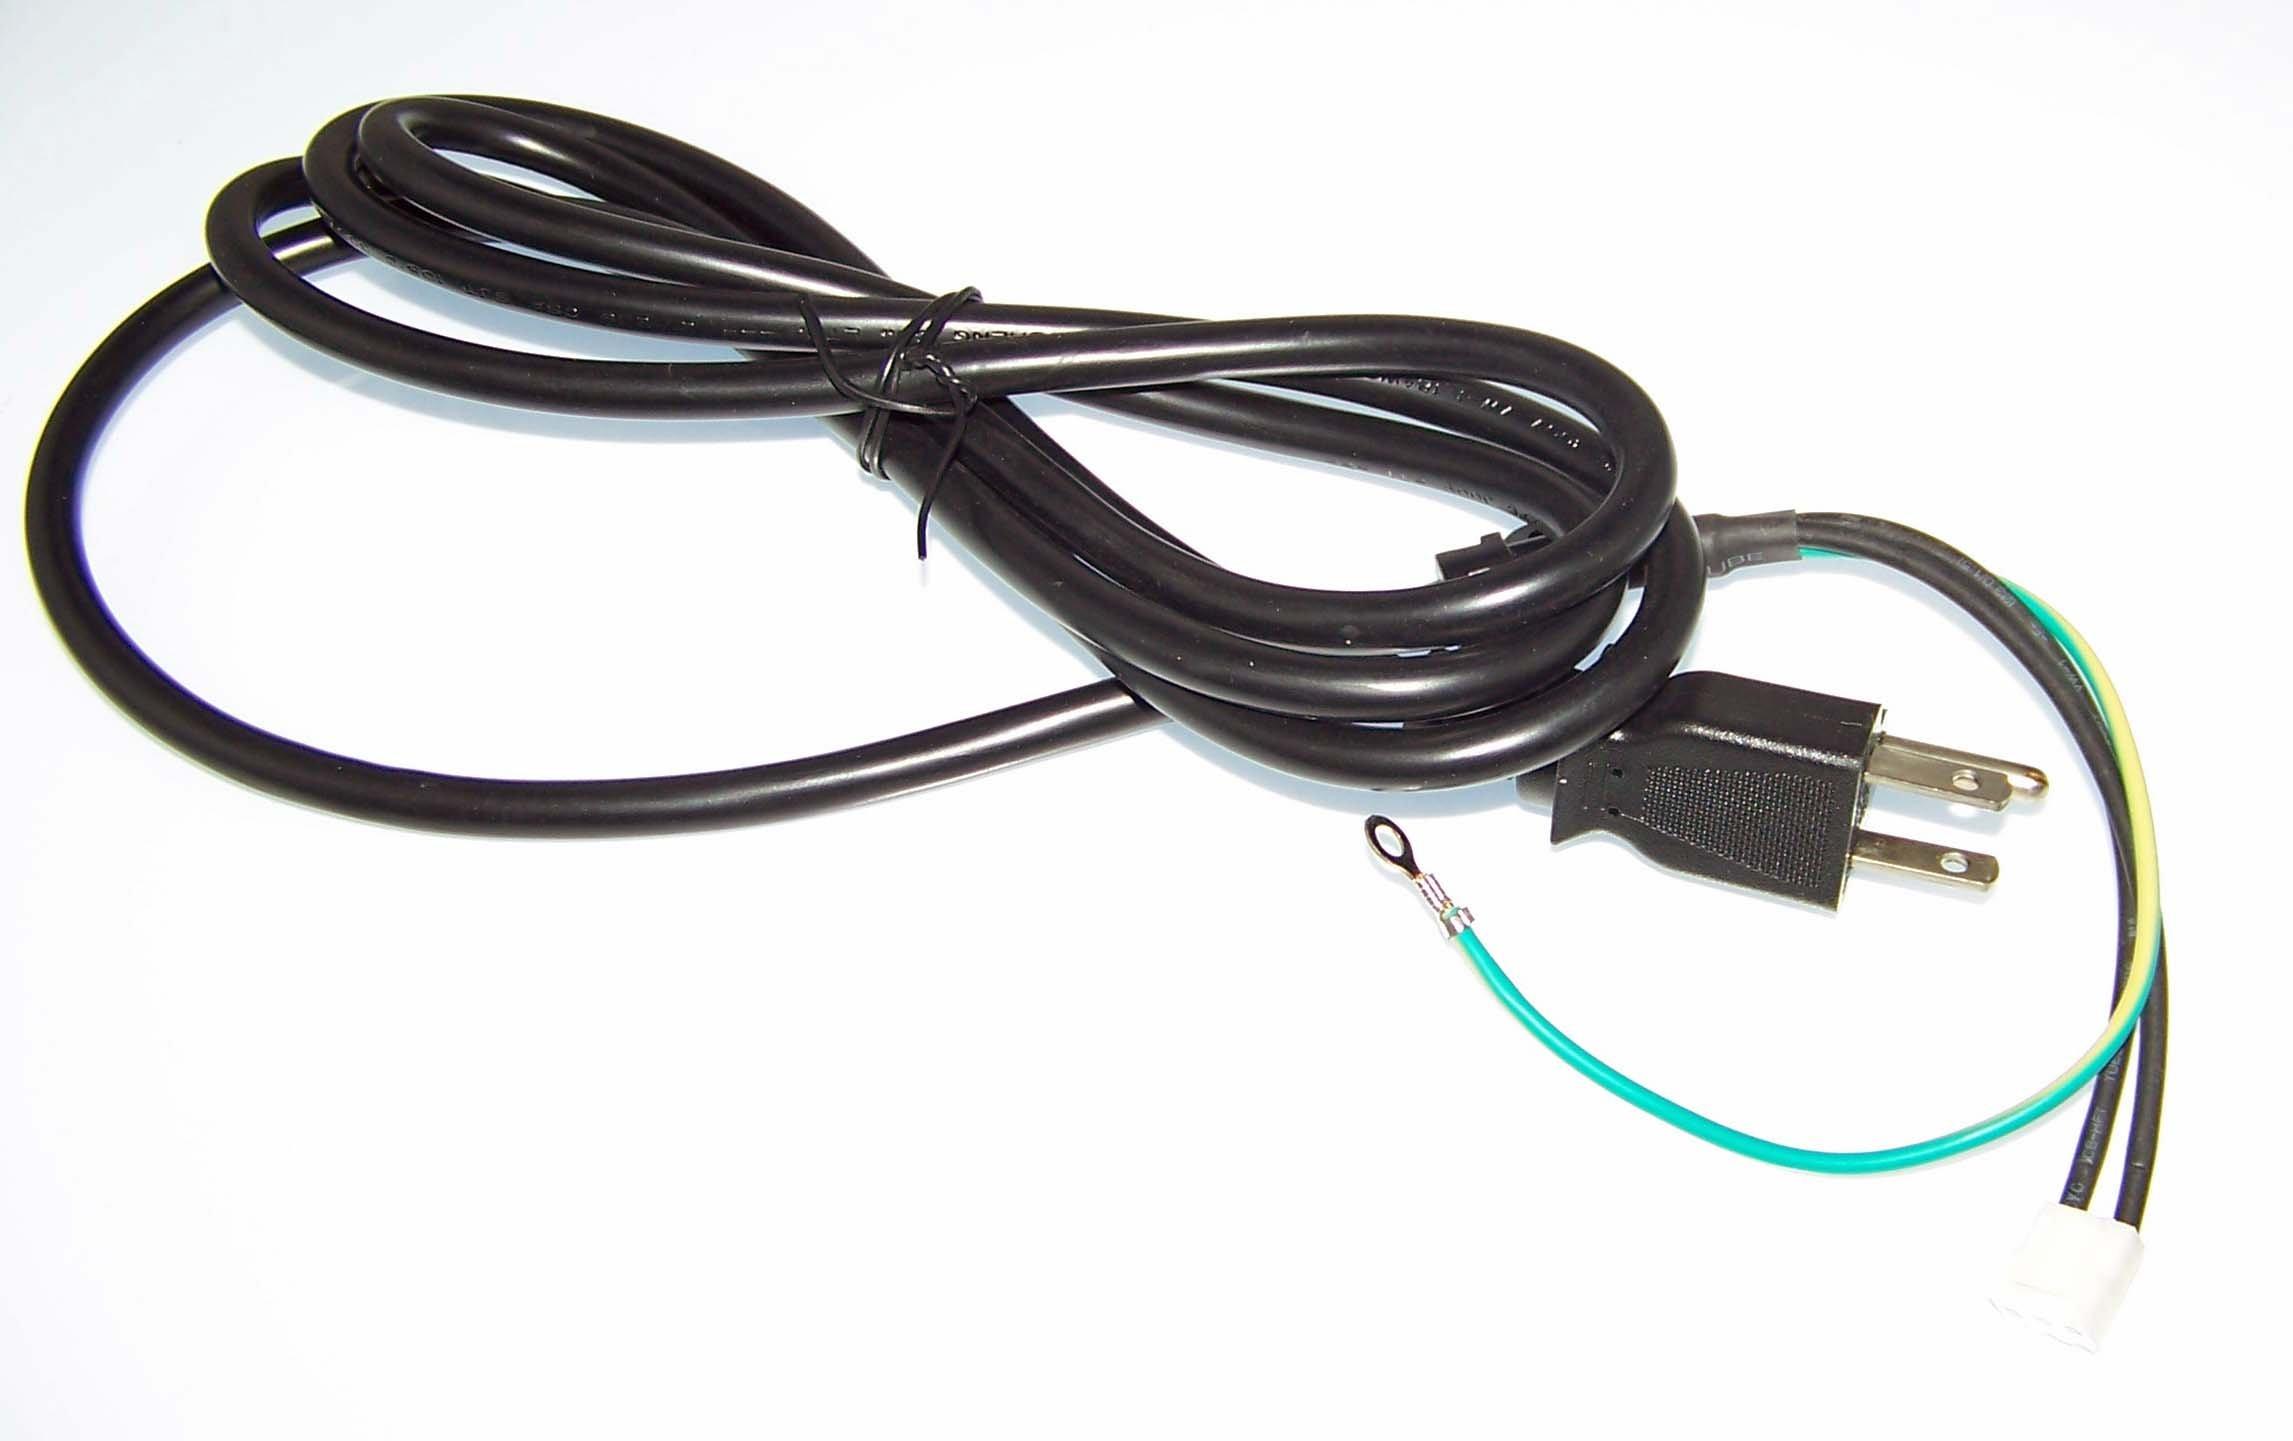 OEM Hisense Power Cord Cable USA Only Originally Shipped with 55T710DW, NS42E440A13, F42K20E